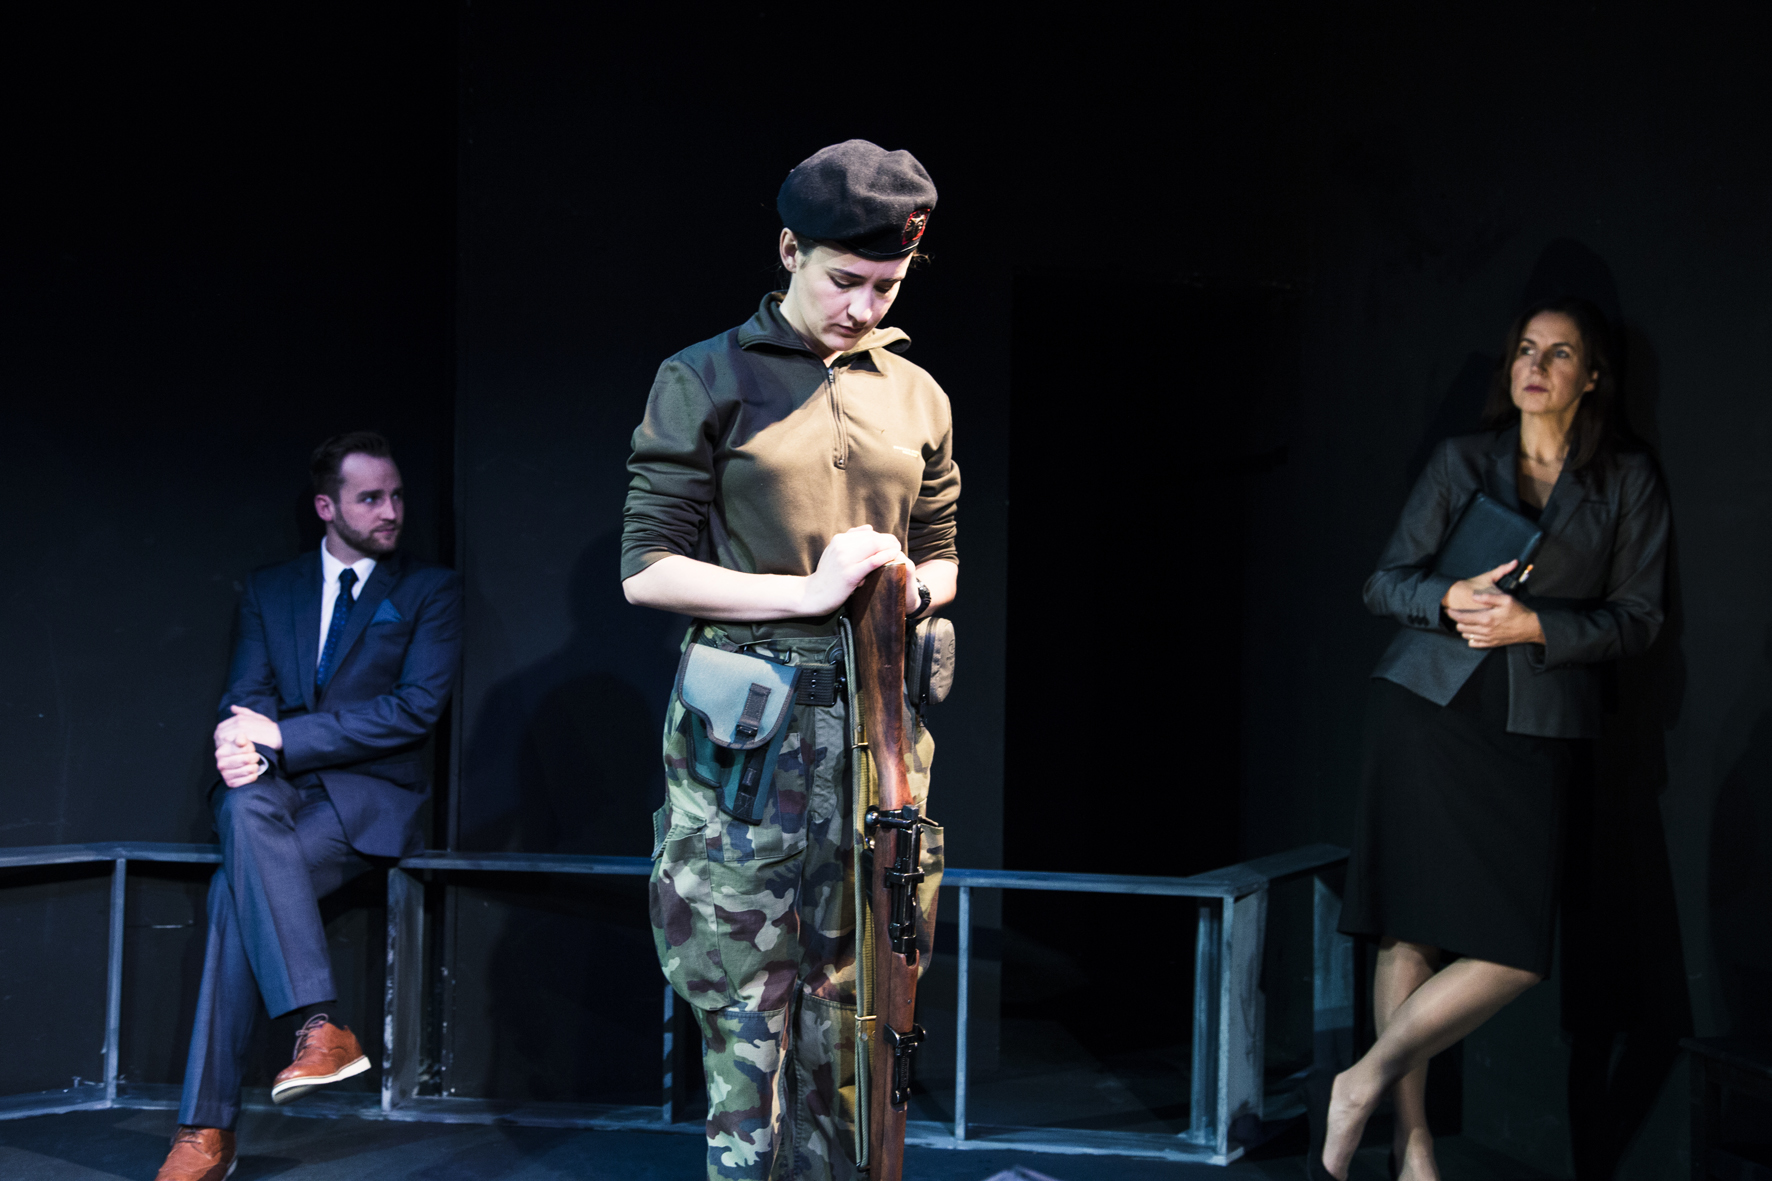 Gerard Humphrey's play Lockdown wins Steward Parker Award 2016